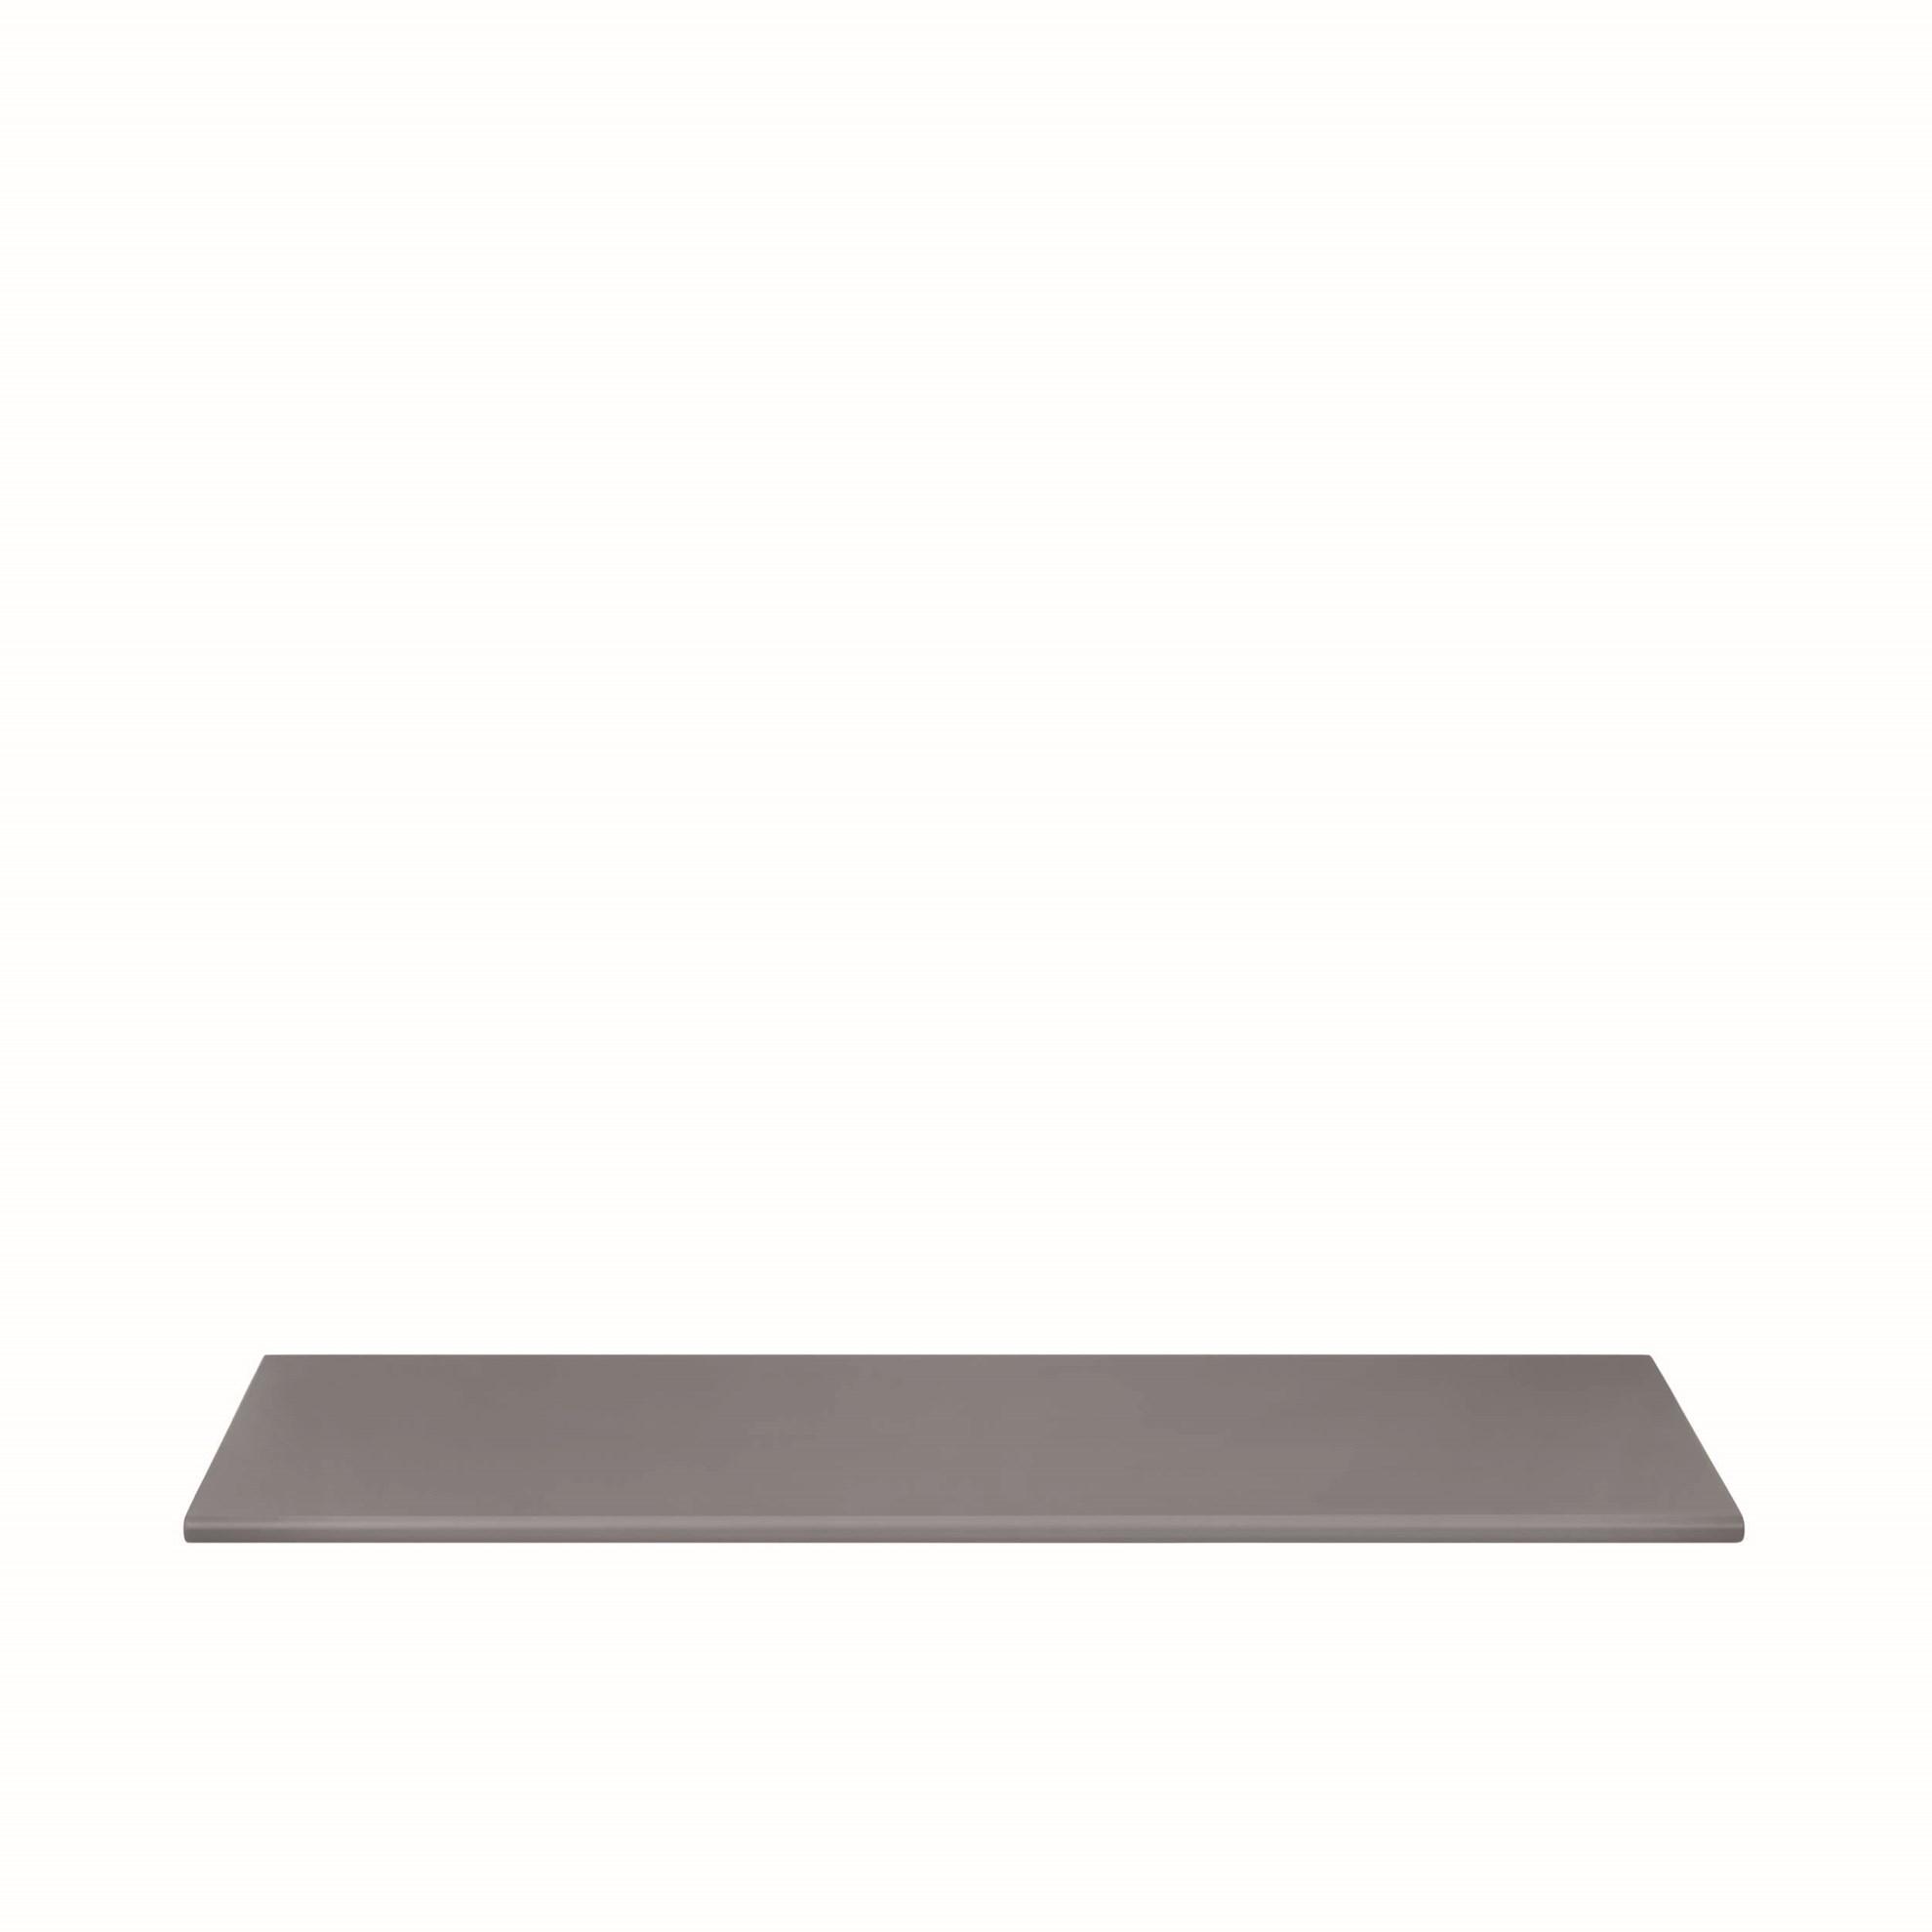 Polička PANOLA 80 cm tmavě šedá_1